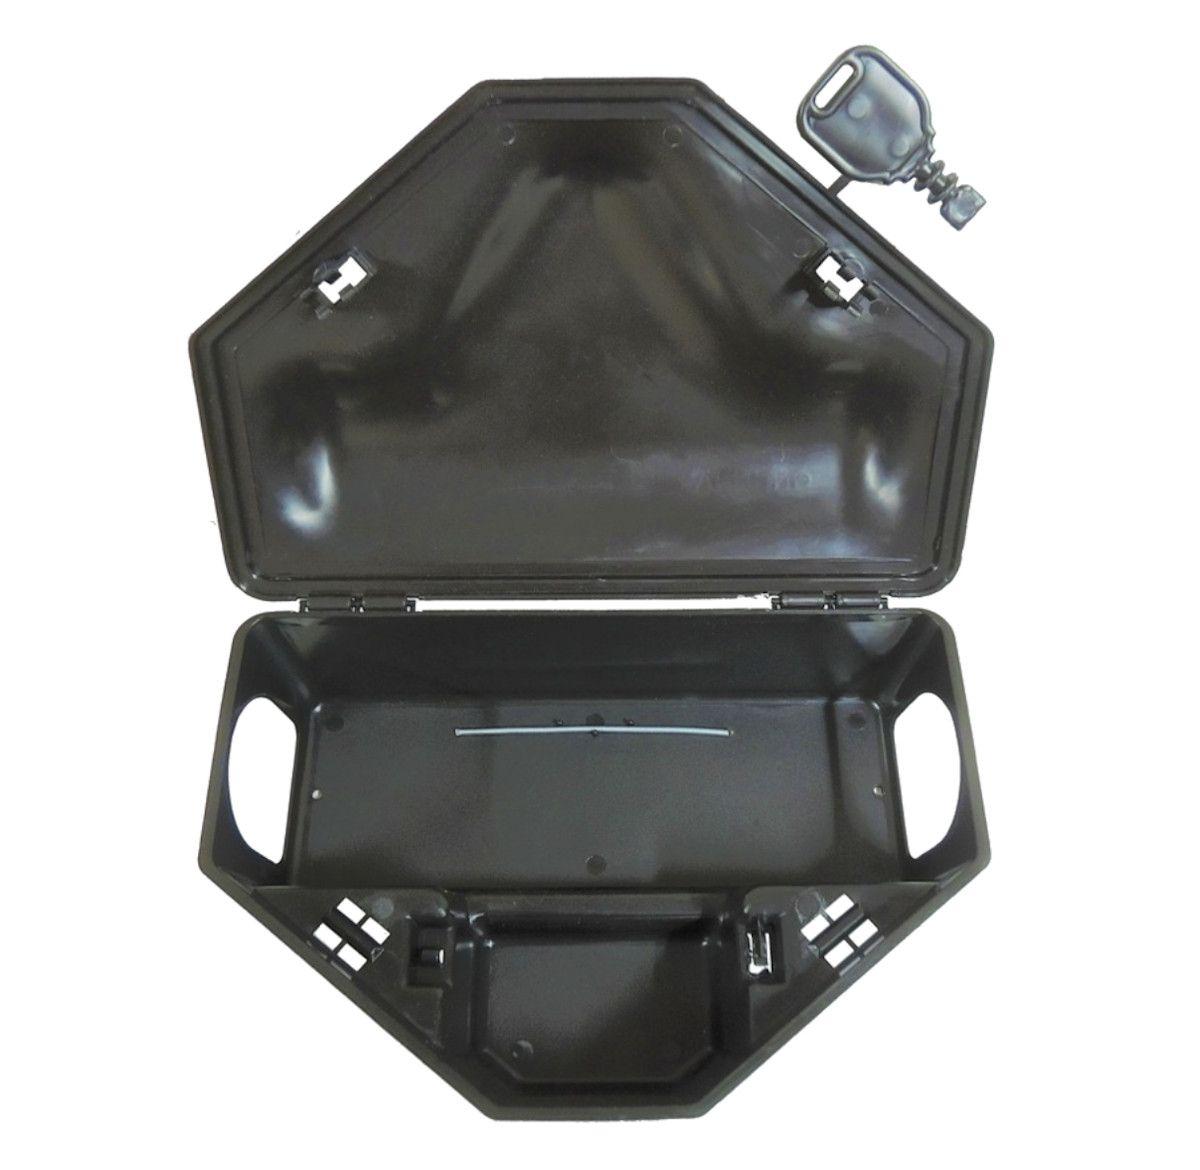 Kit 34 Porta Isca Com 2 Chaves - Duplo Travamento